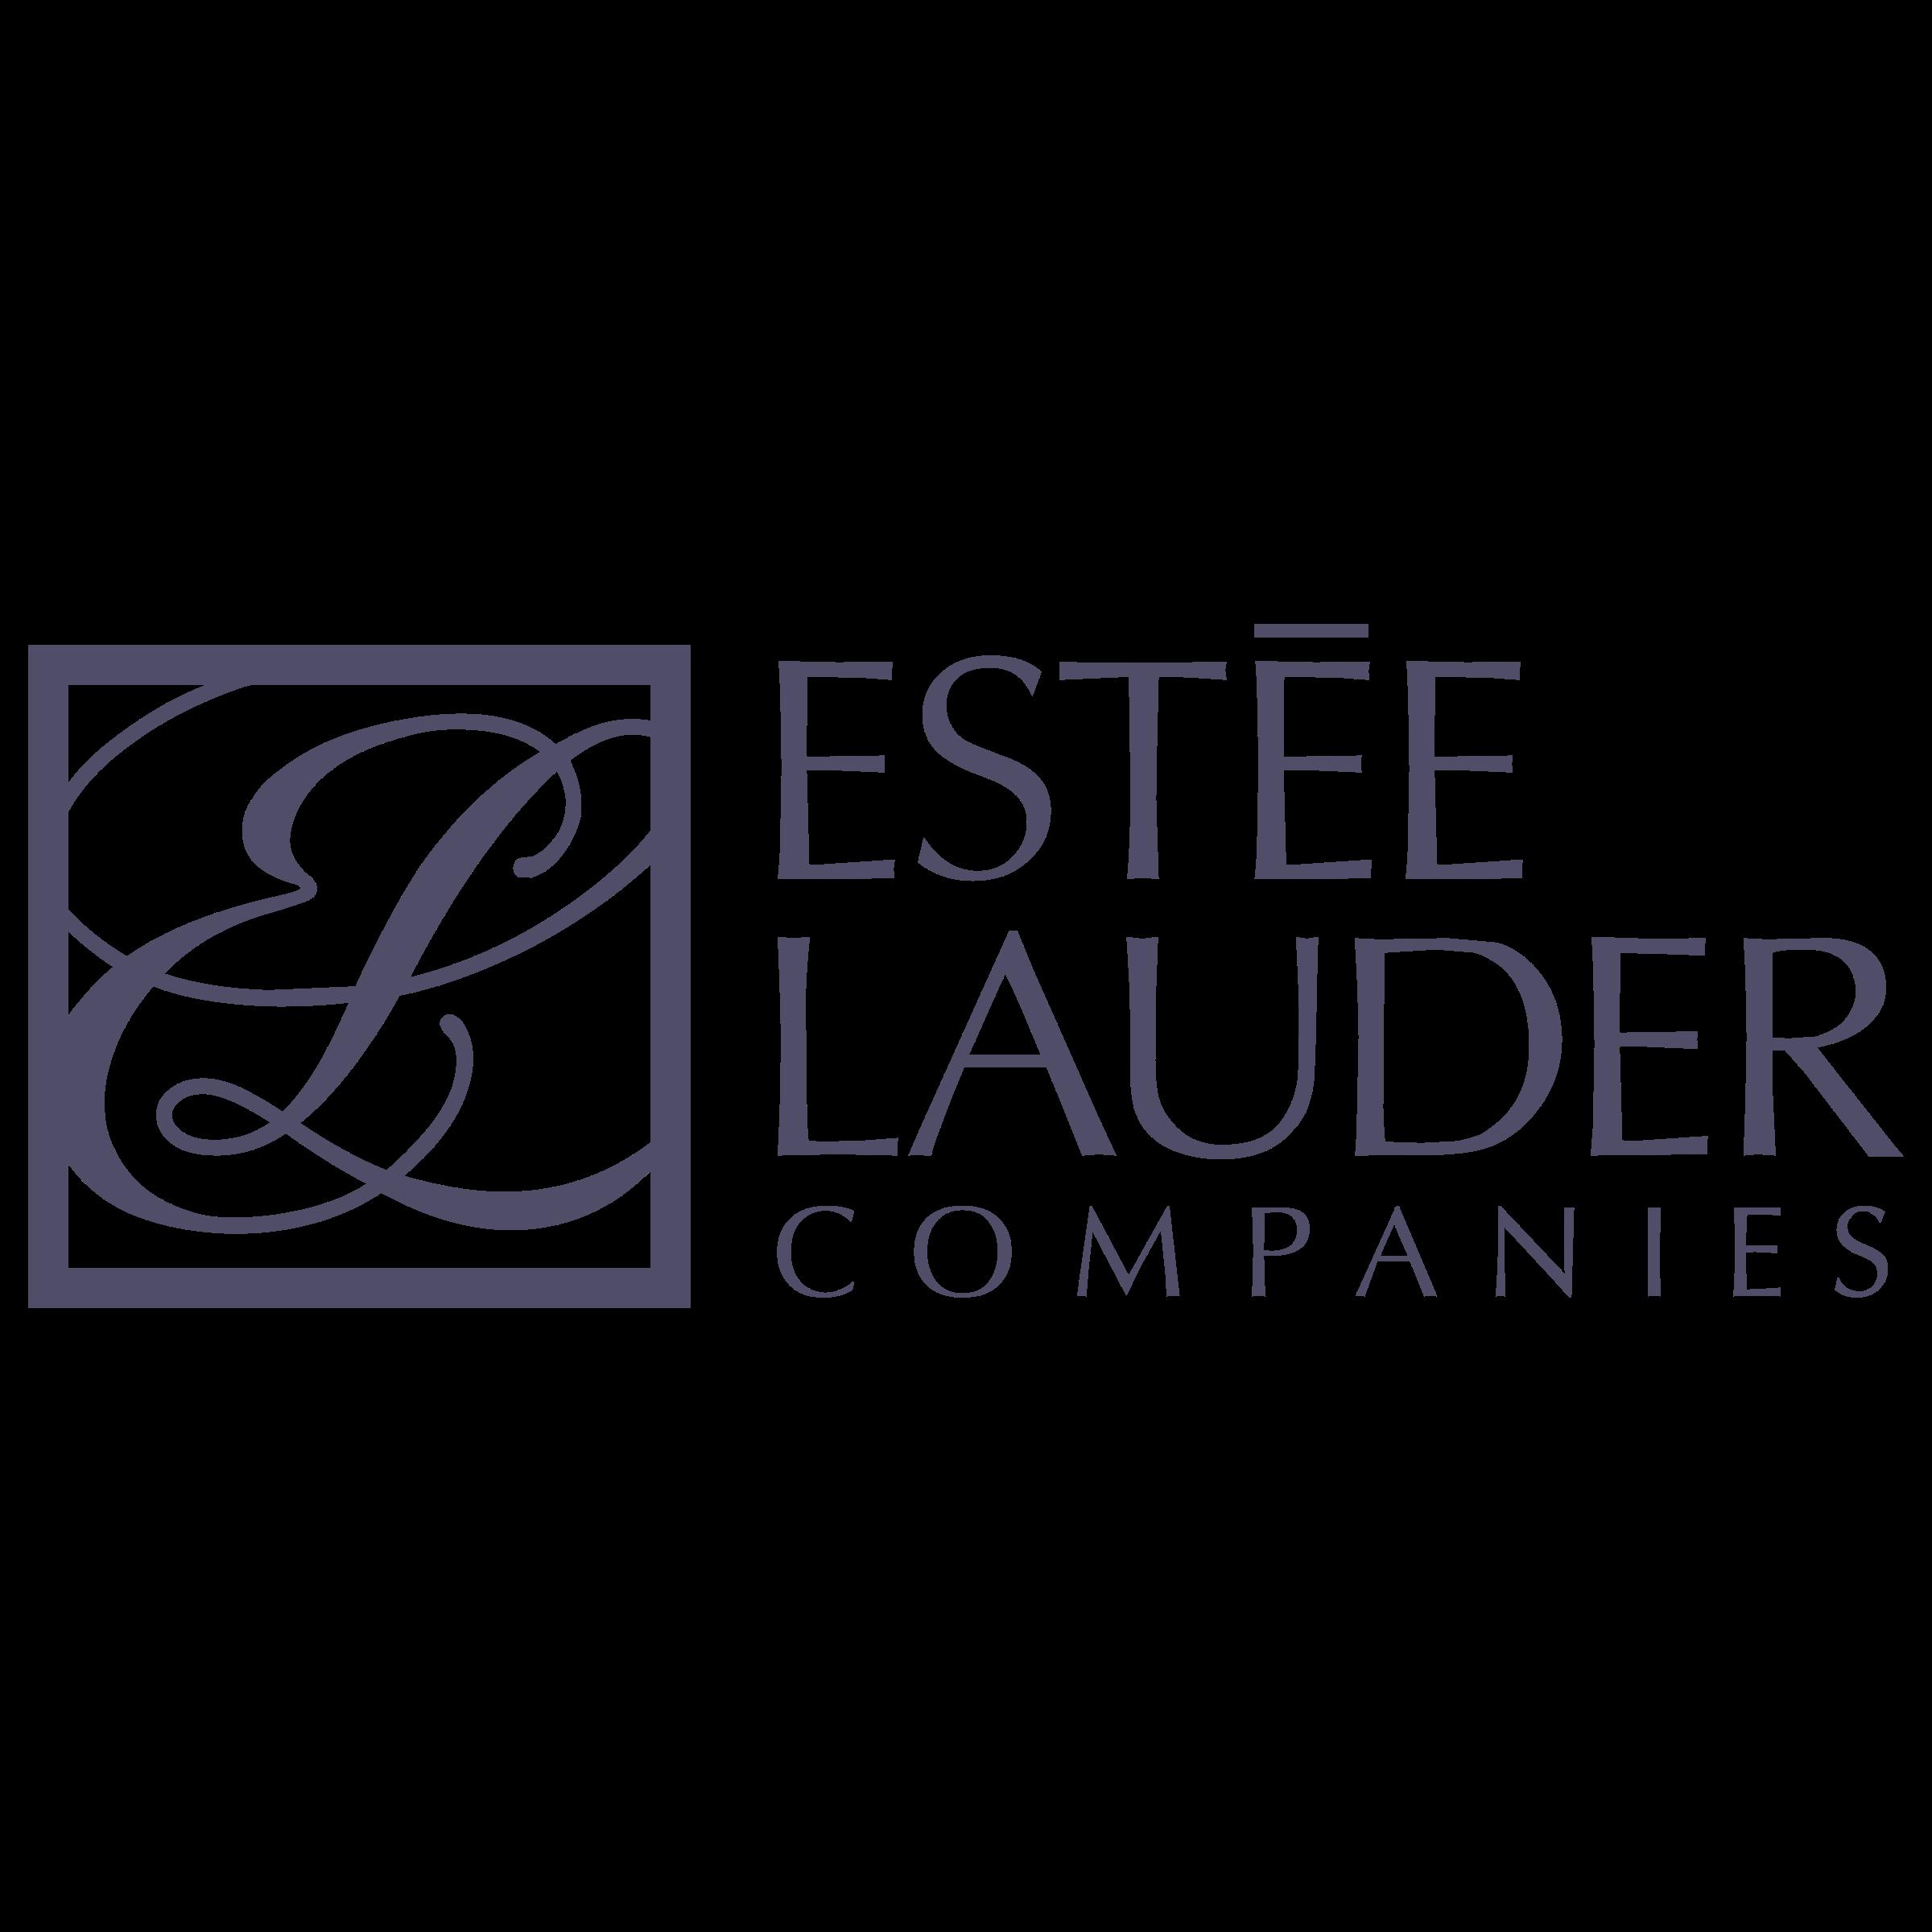 Estee Lauder Logo PNG Transparent & SVG Vector.